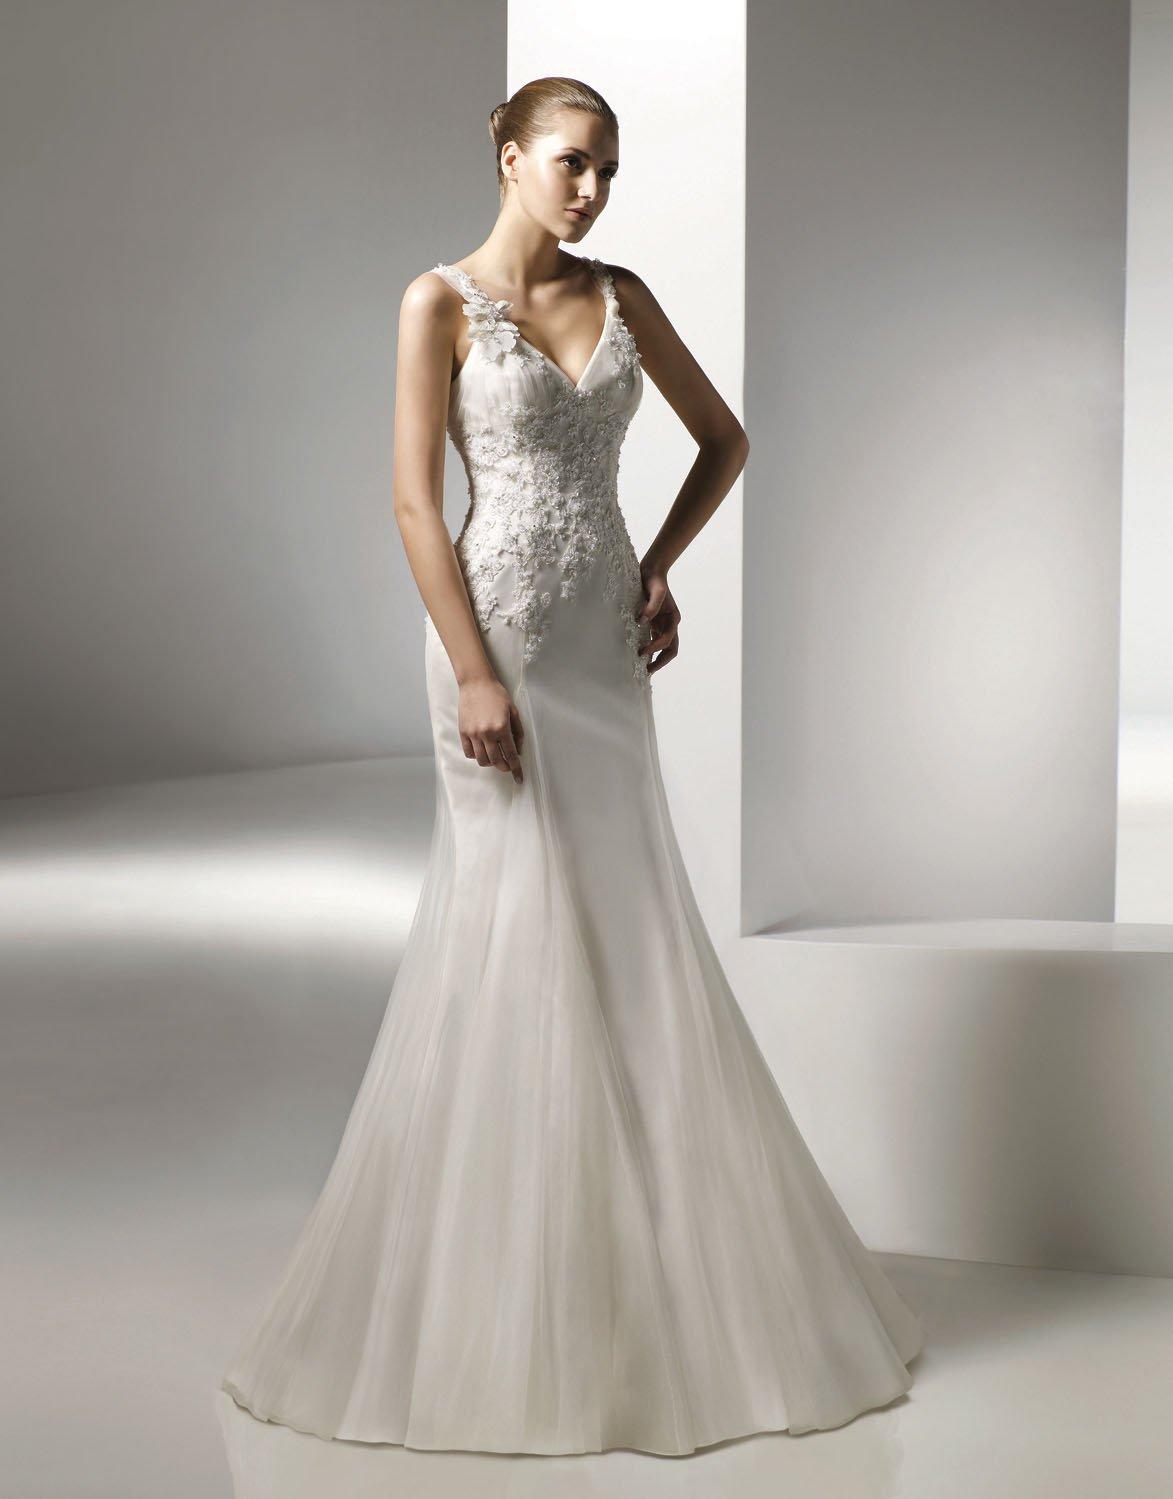 V-neckline Appliqued Beading Tuller Wedding Dress Bridal Gown aq0037